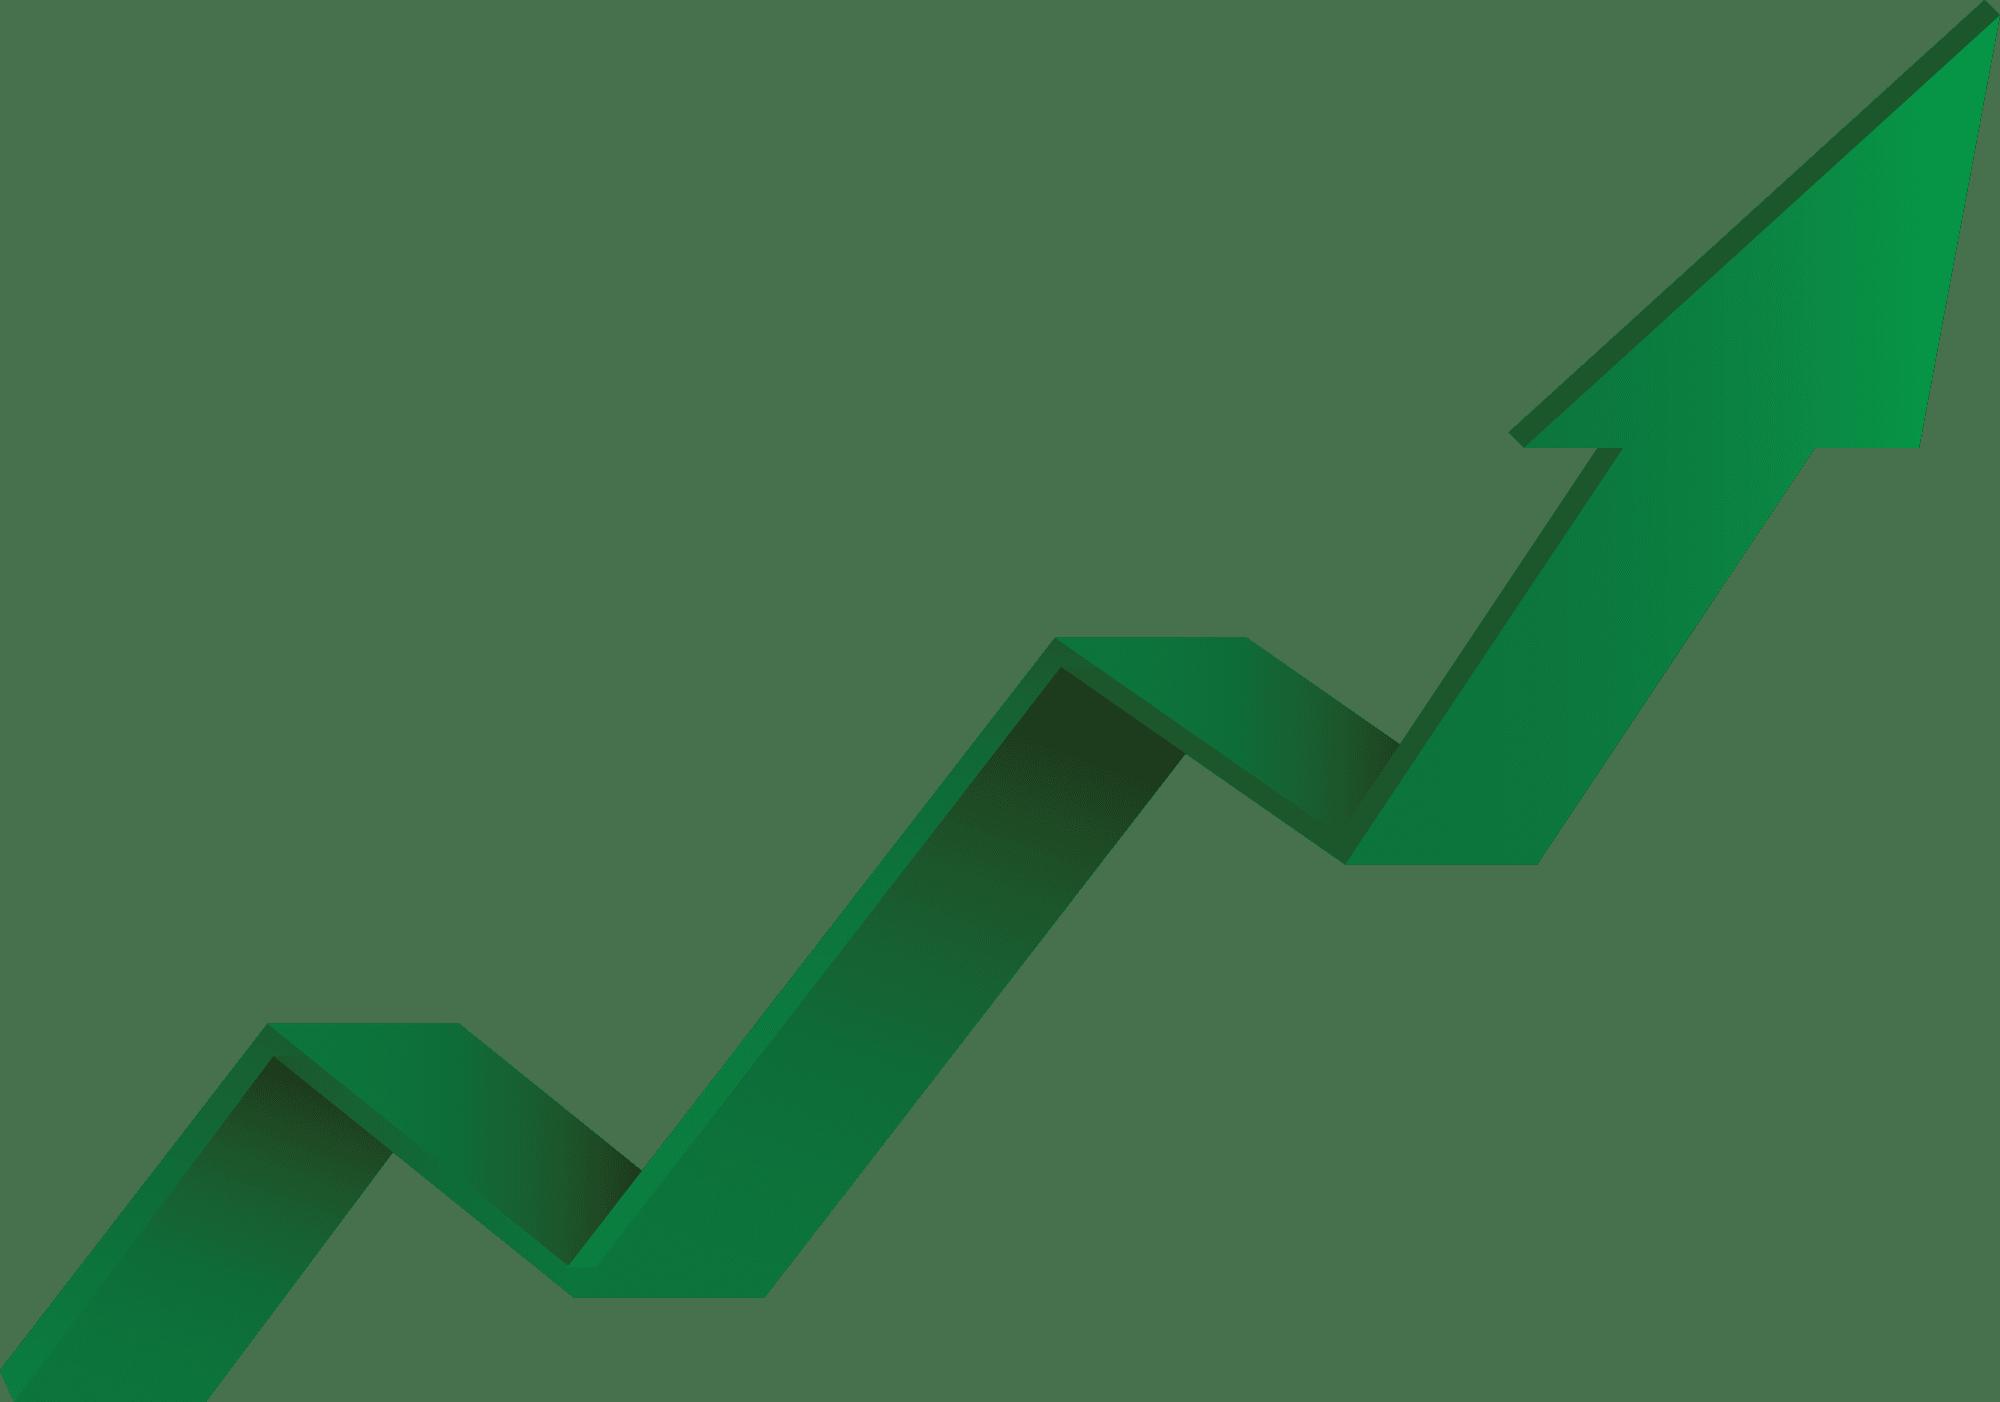 Upward green arrow